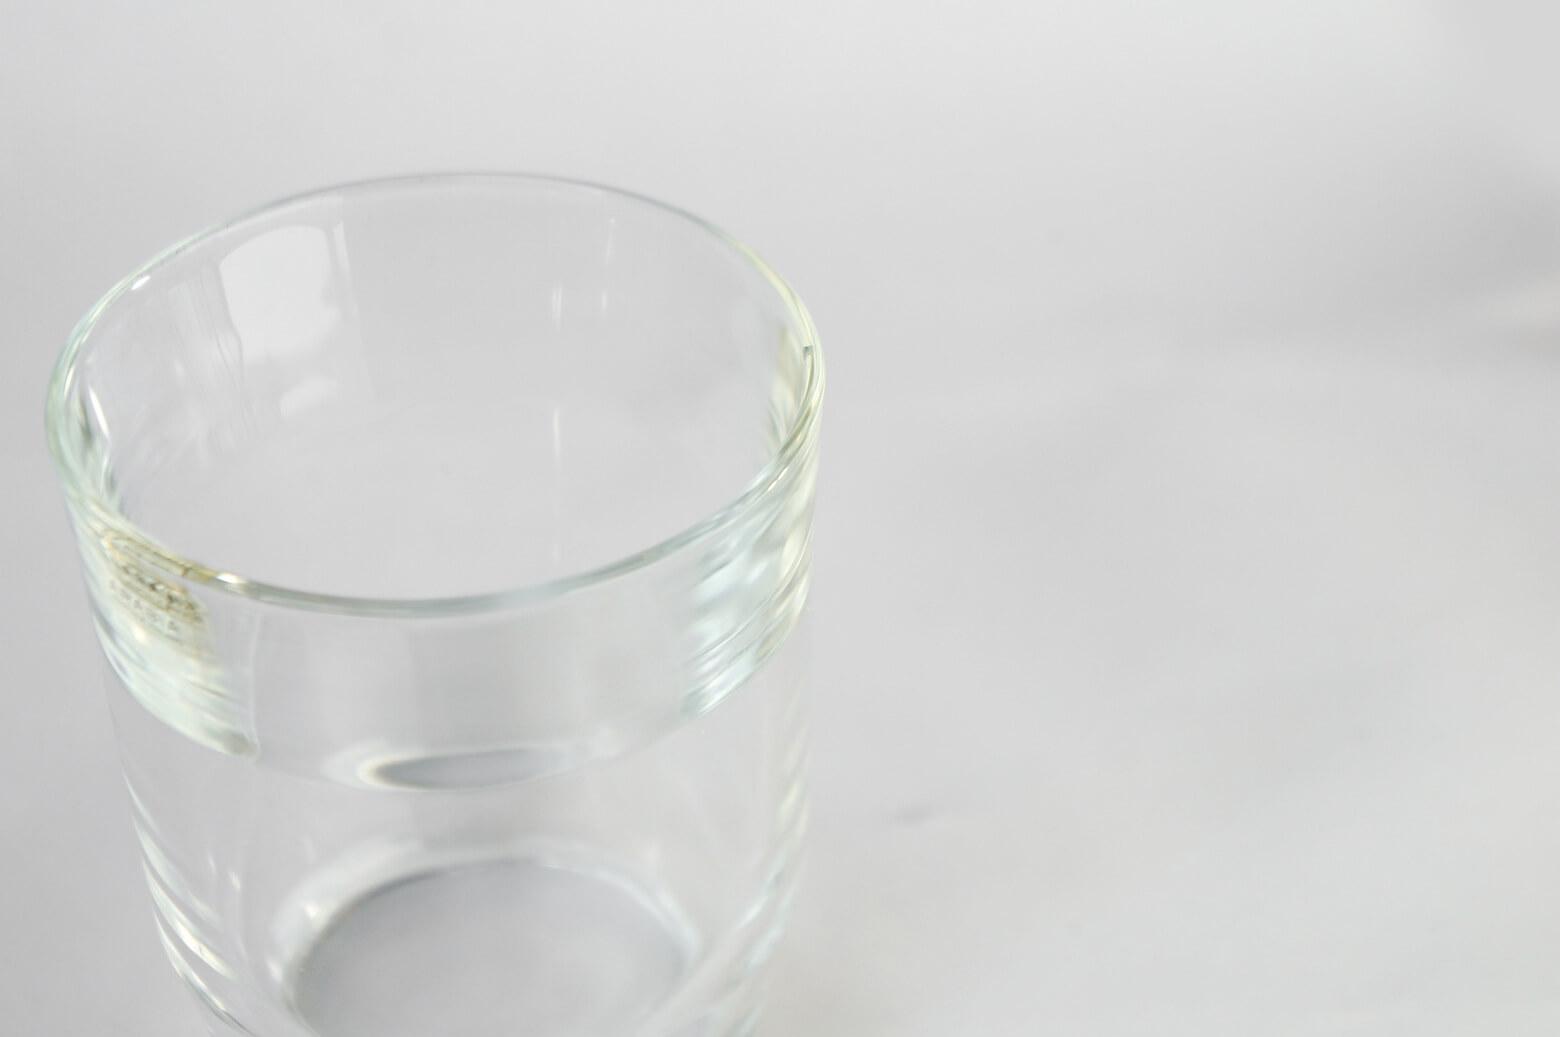 ARABIA Tumbler PRISMA Kaj Franck/アラビア タンブラー プリズマ カイ・フランク グラス ヴィンテージ 北欧食器 2